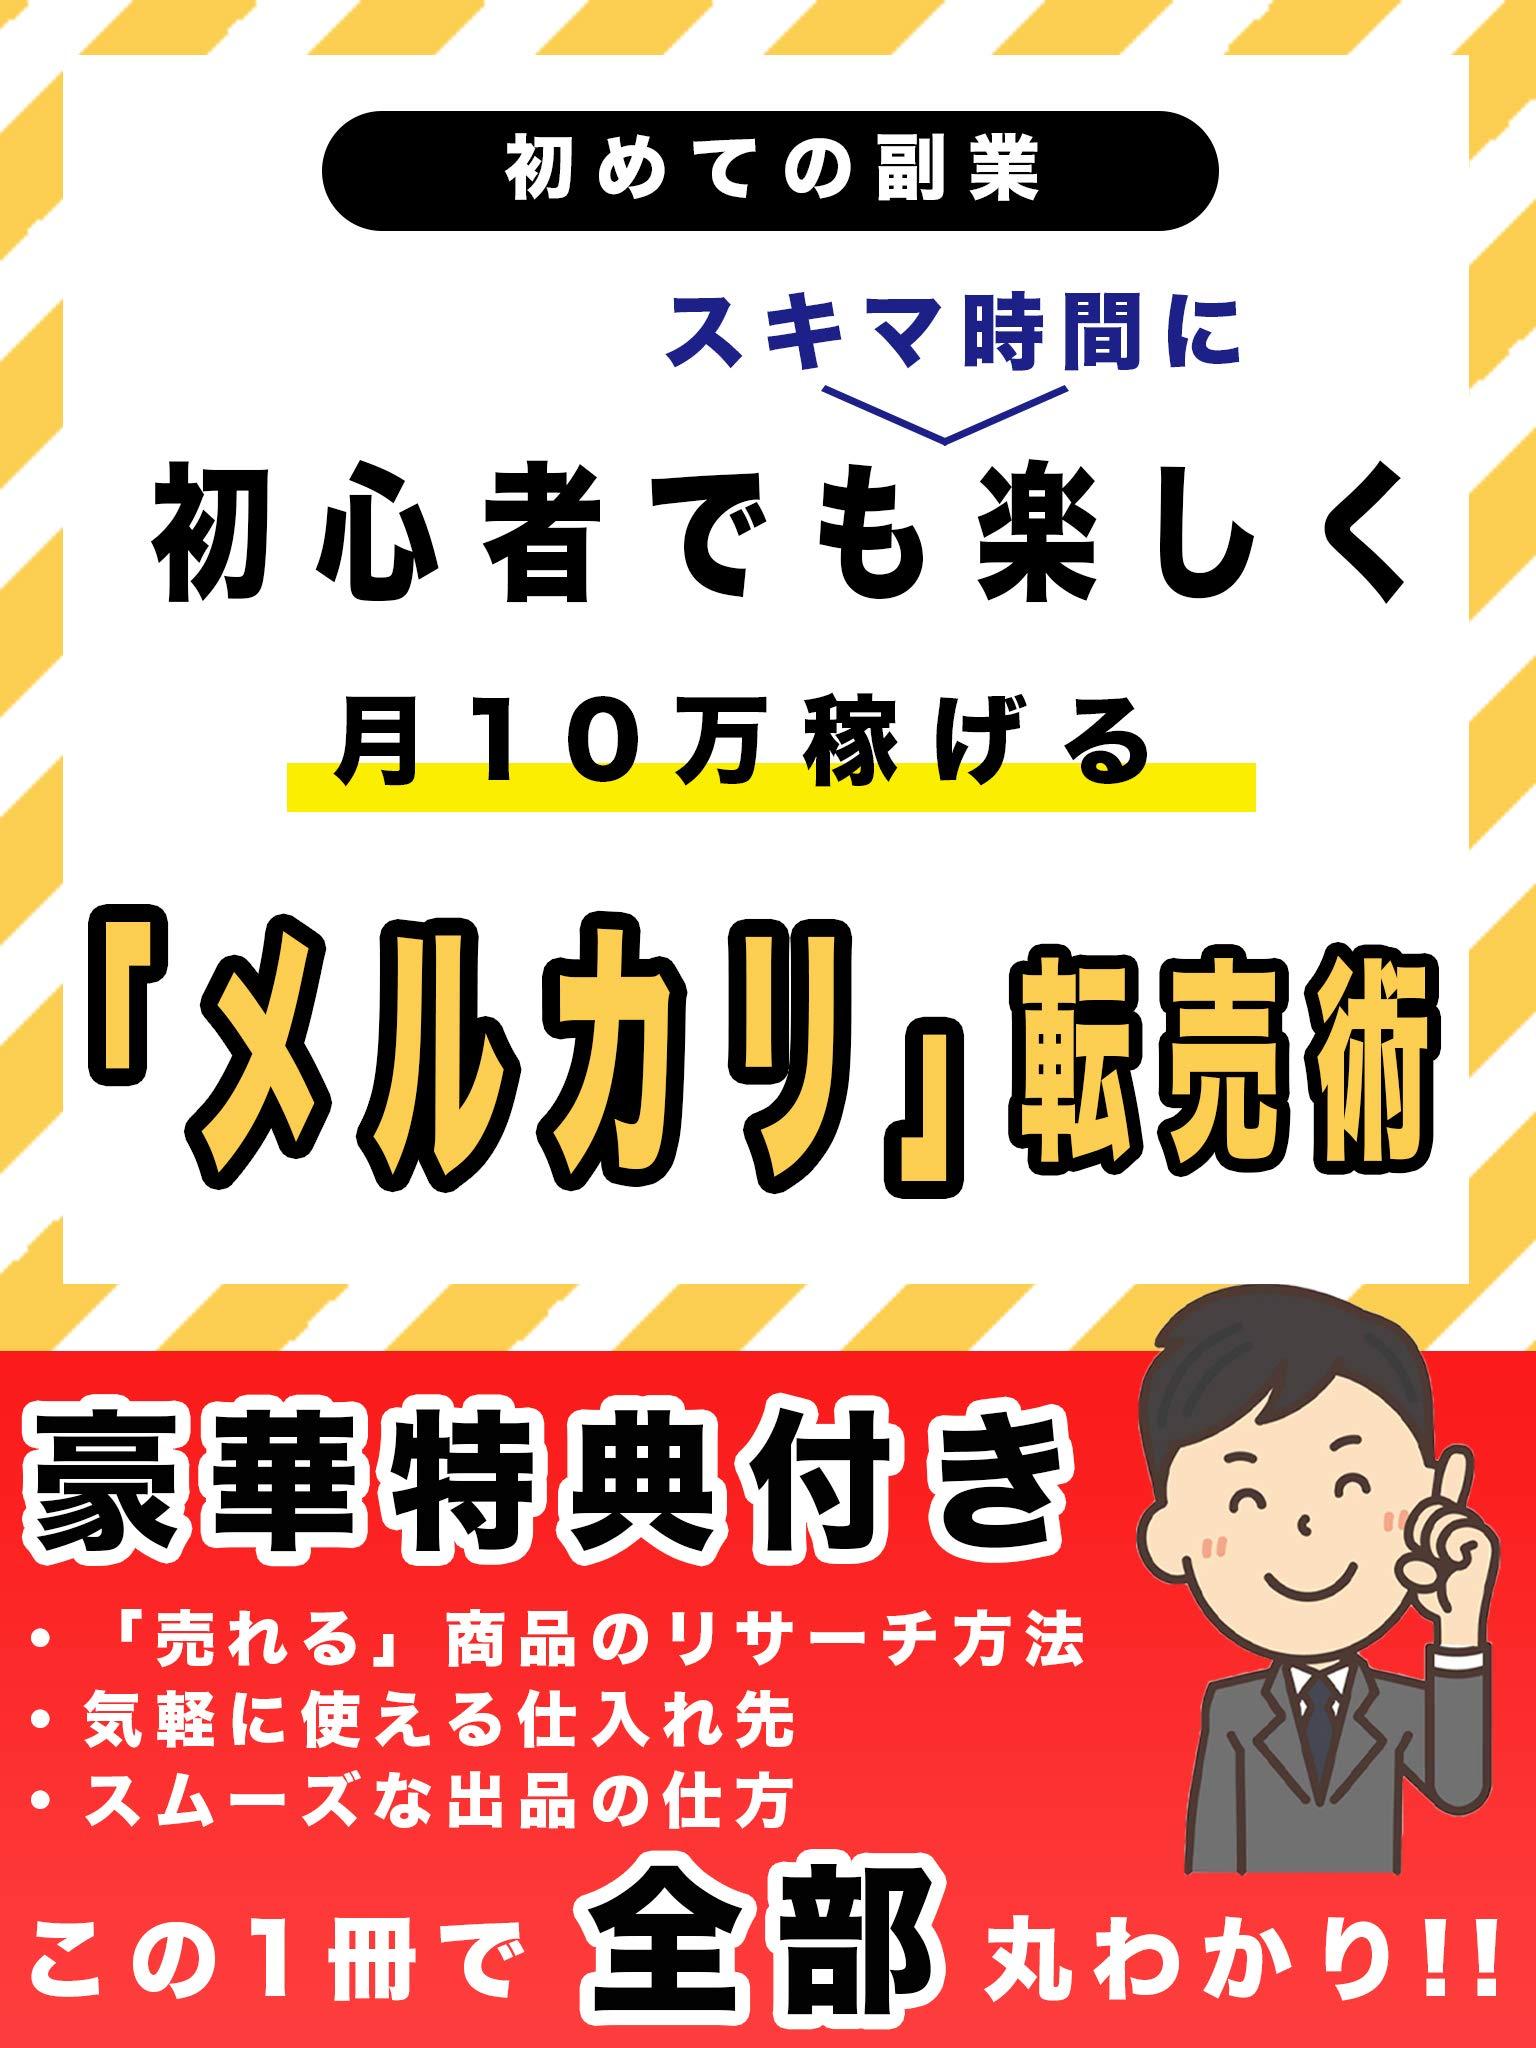 hazimetenohukugyosyoshinsyademotsuki10mannkasegerumerukaritenbaijutsu (Japanese Edition)